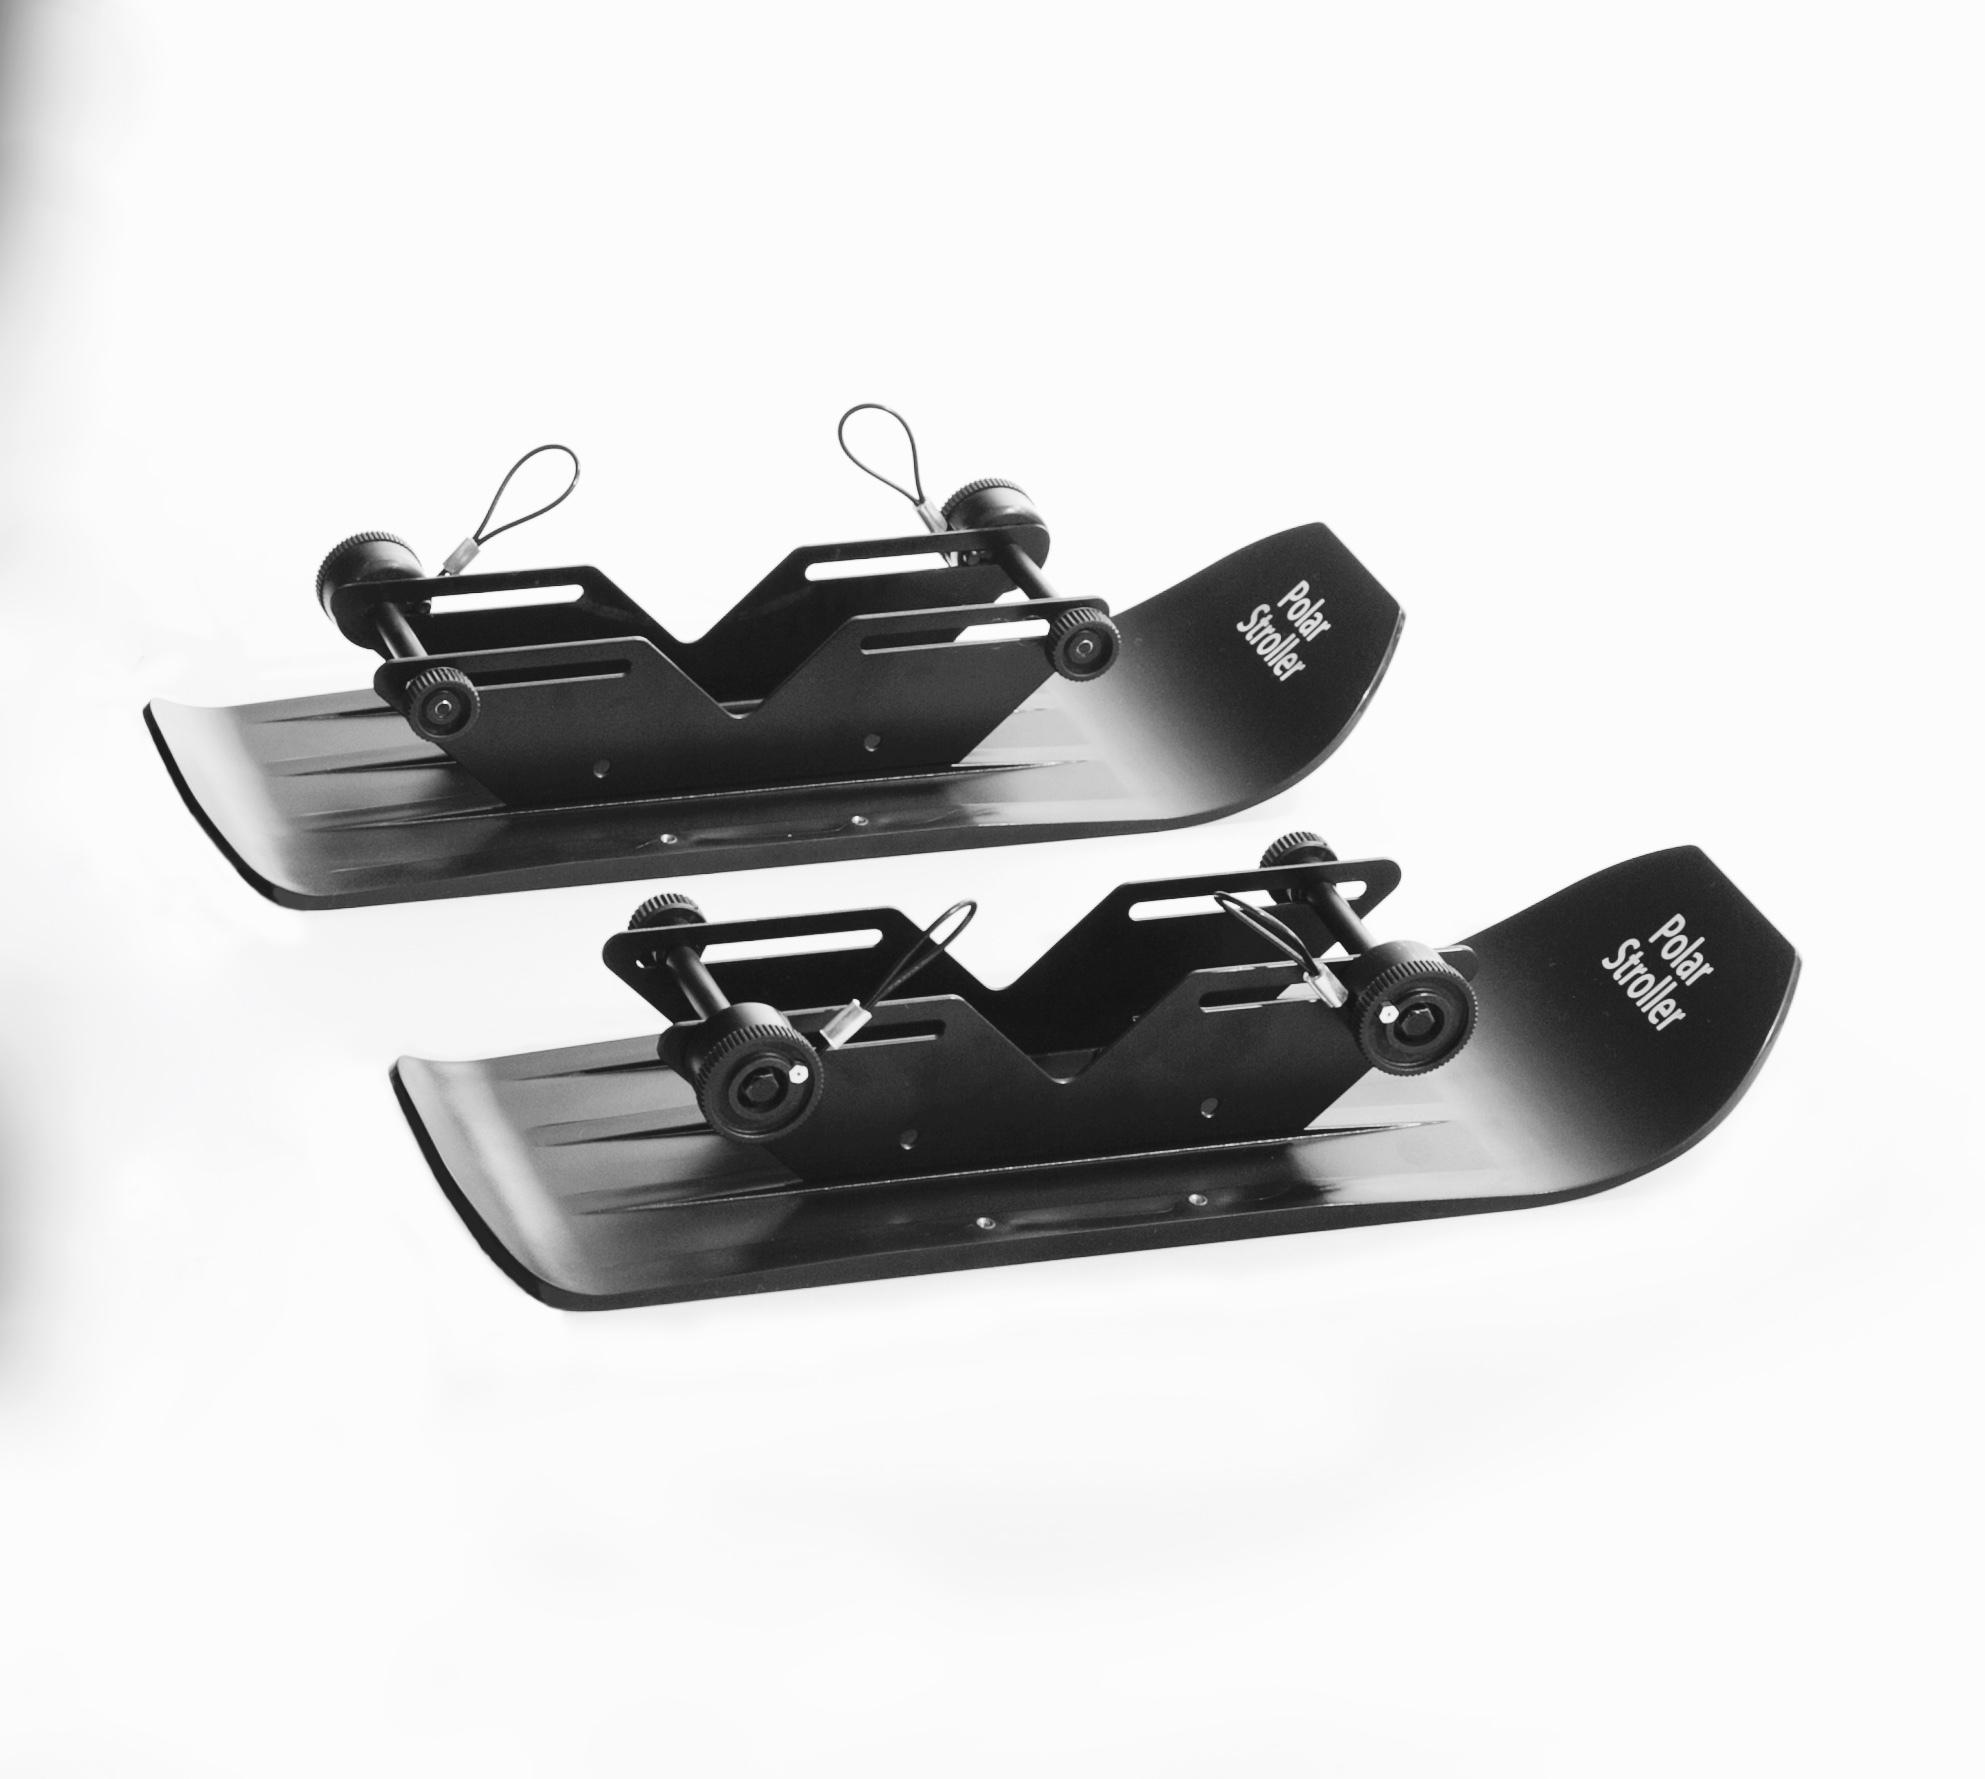 2 Set of 4X4 Polar Stroller Skis 00015